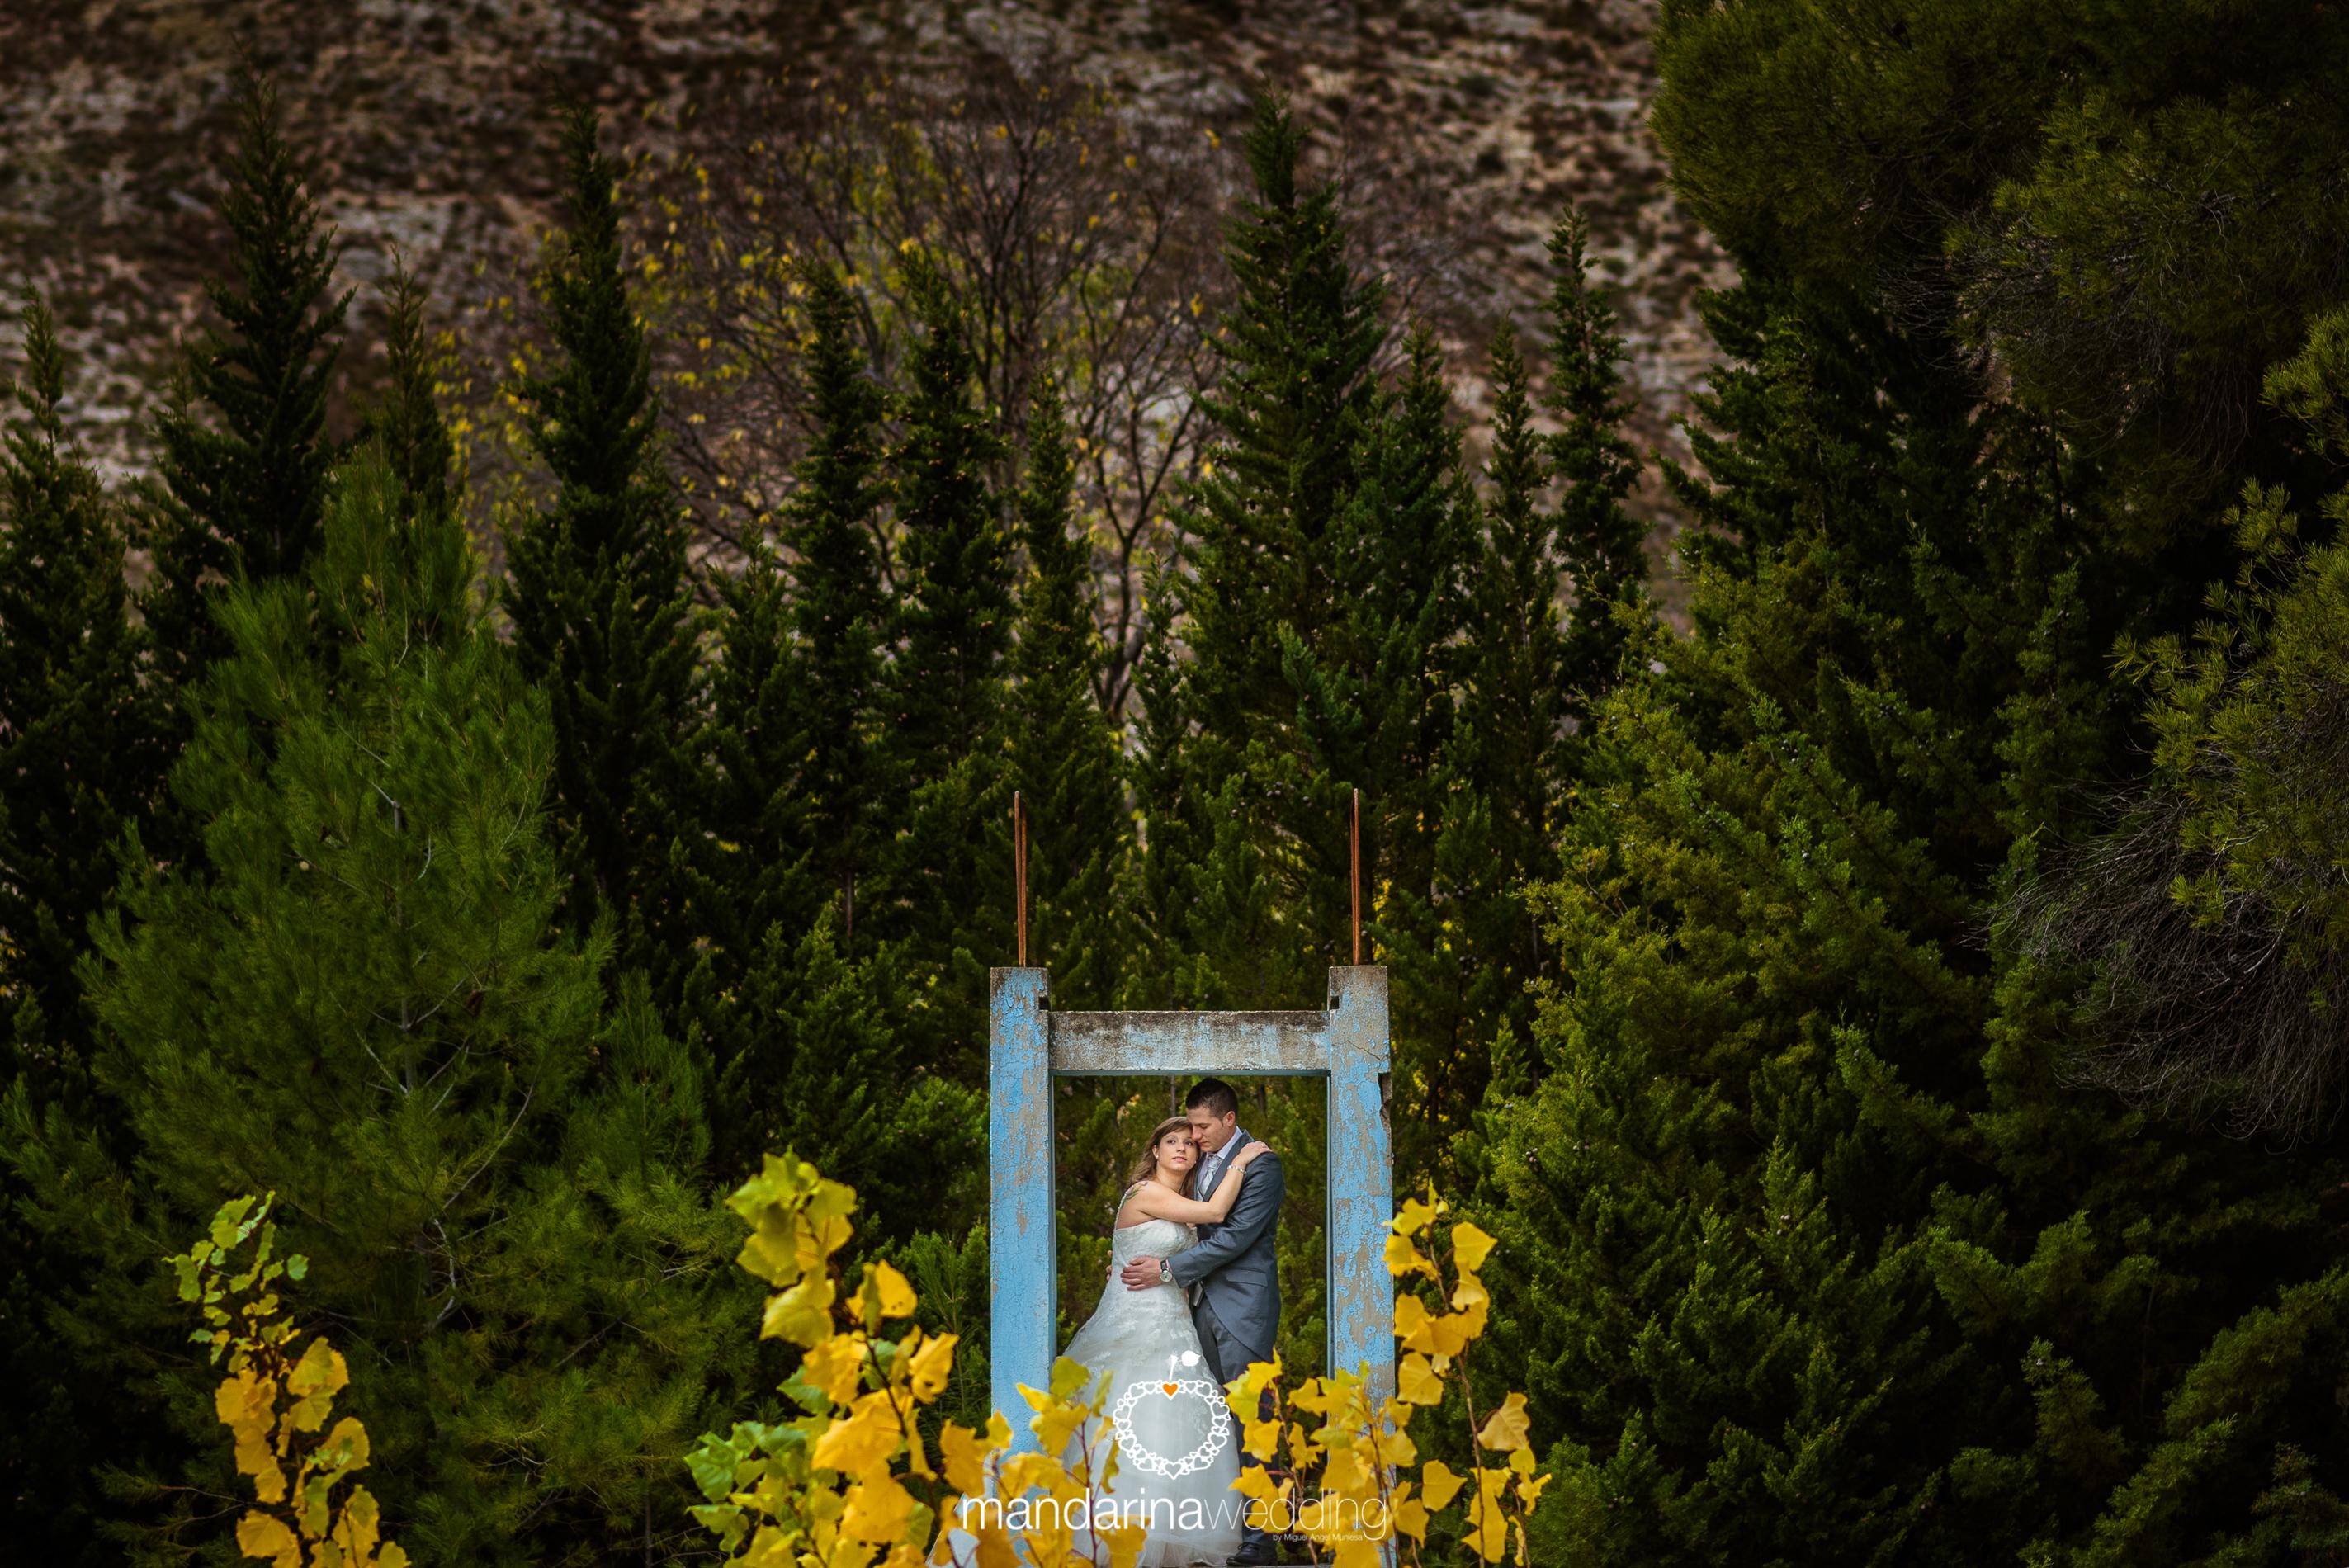 mandarina wedding, fotogarfos boda zaragoza, postboda, postboda en oliete, fotografos boda teruel, fotografos huesca_10